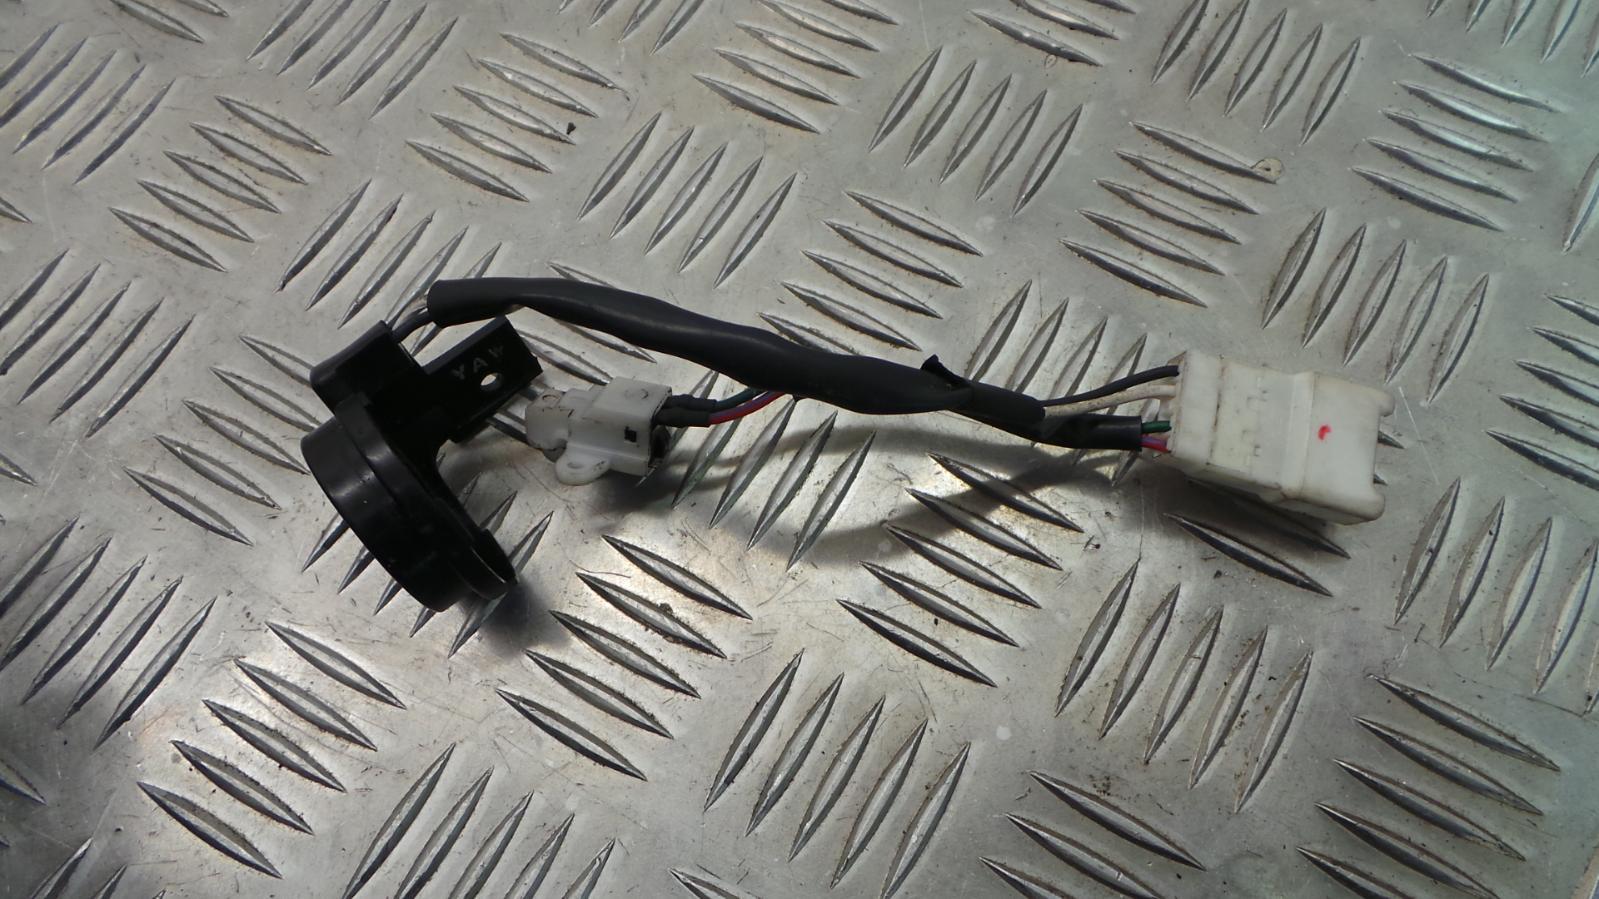 2003 Hyundai Getz 13 Petrol Manual Ignition Kit Engine Ecu Fuse Box Astra Gsi 3 Of 12